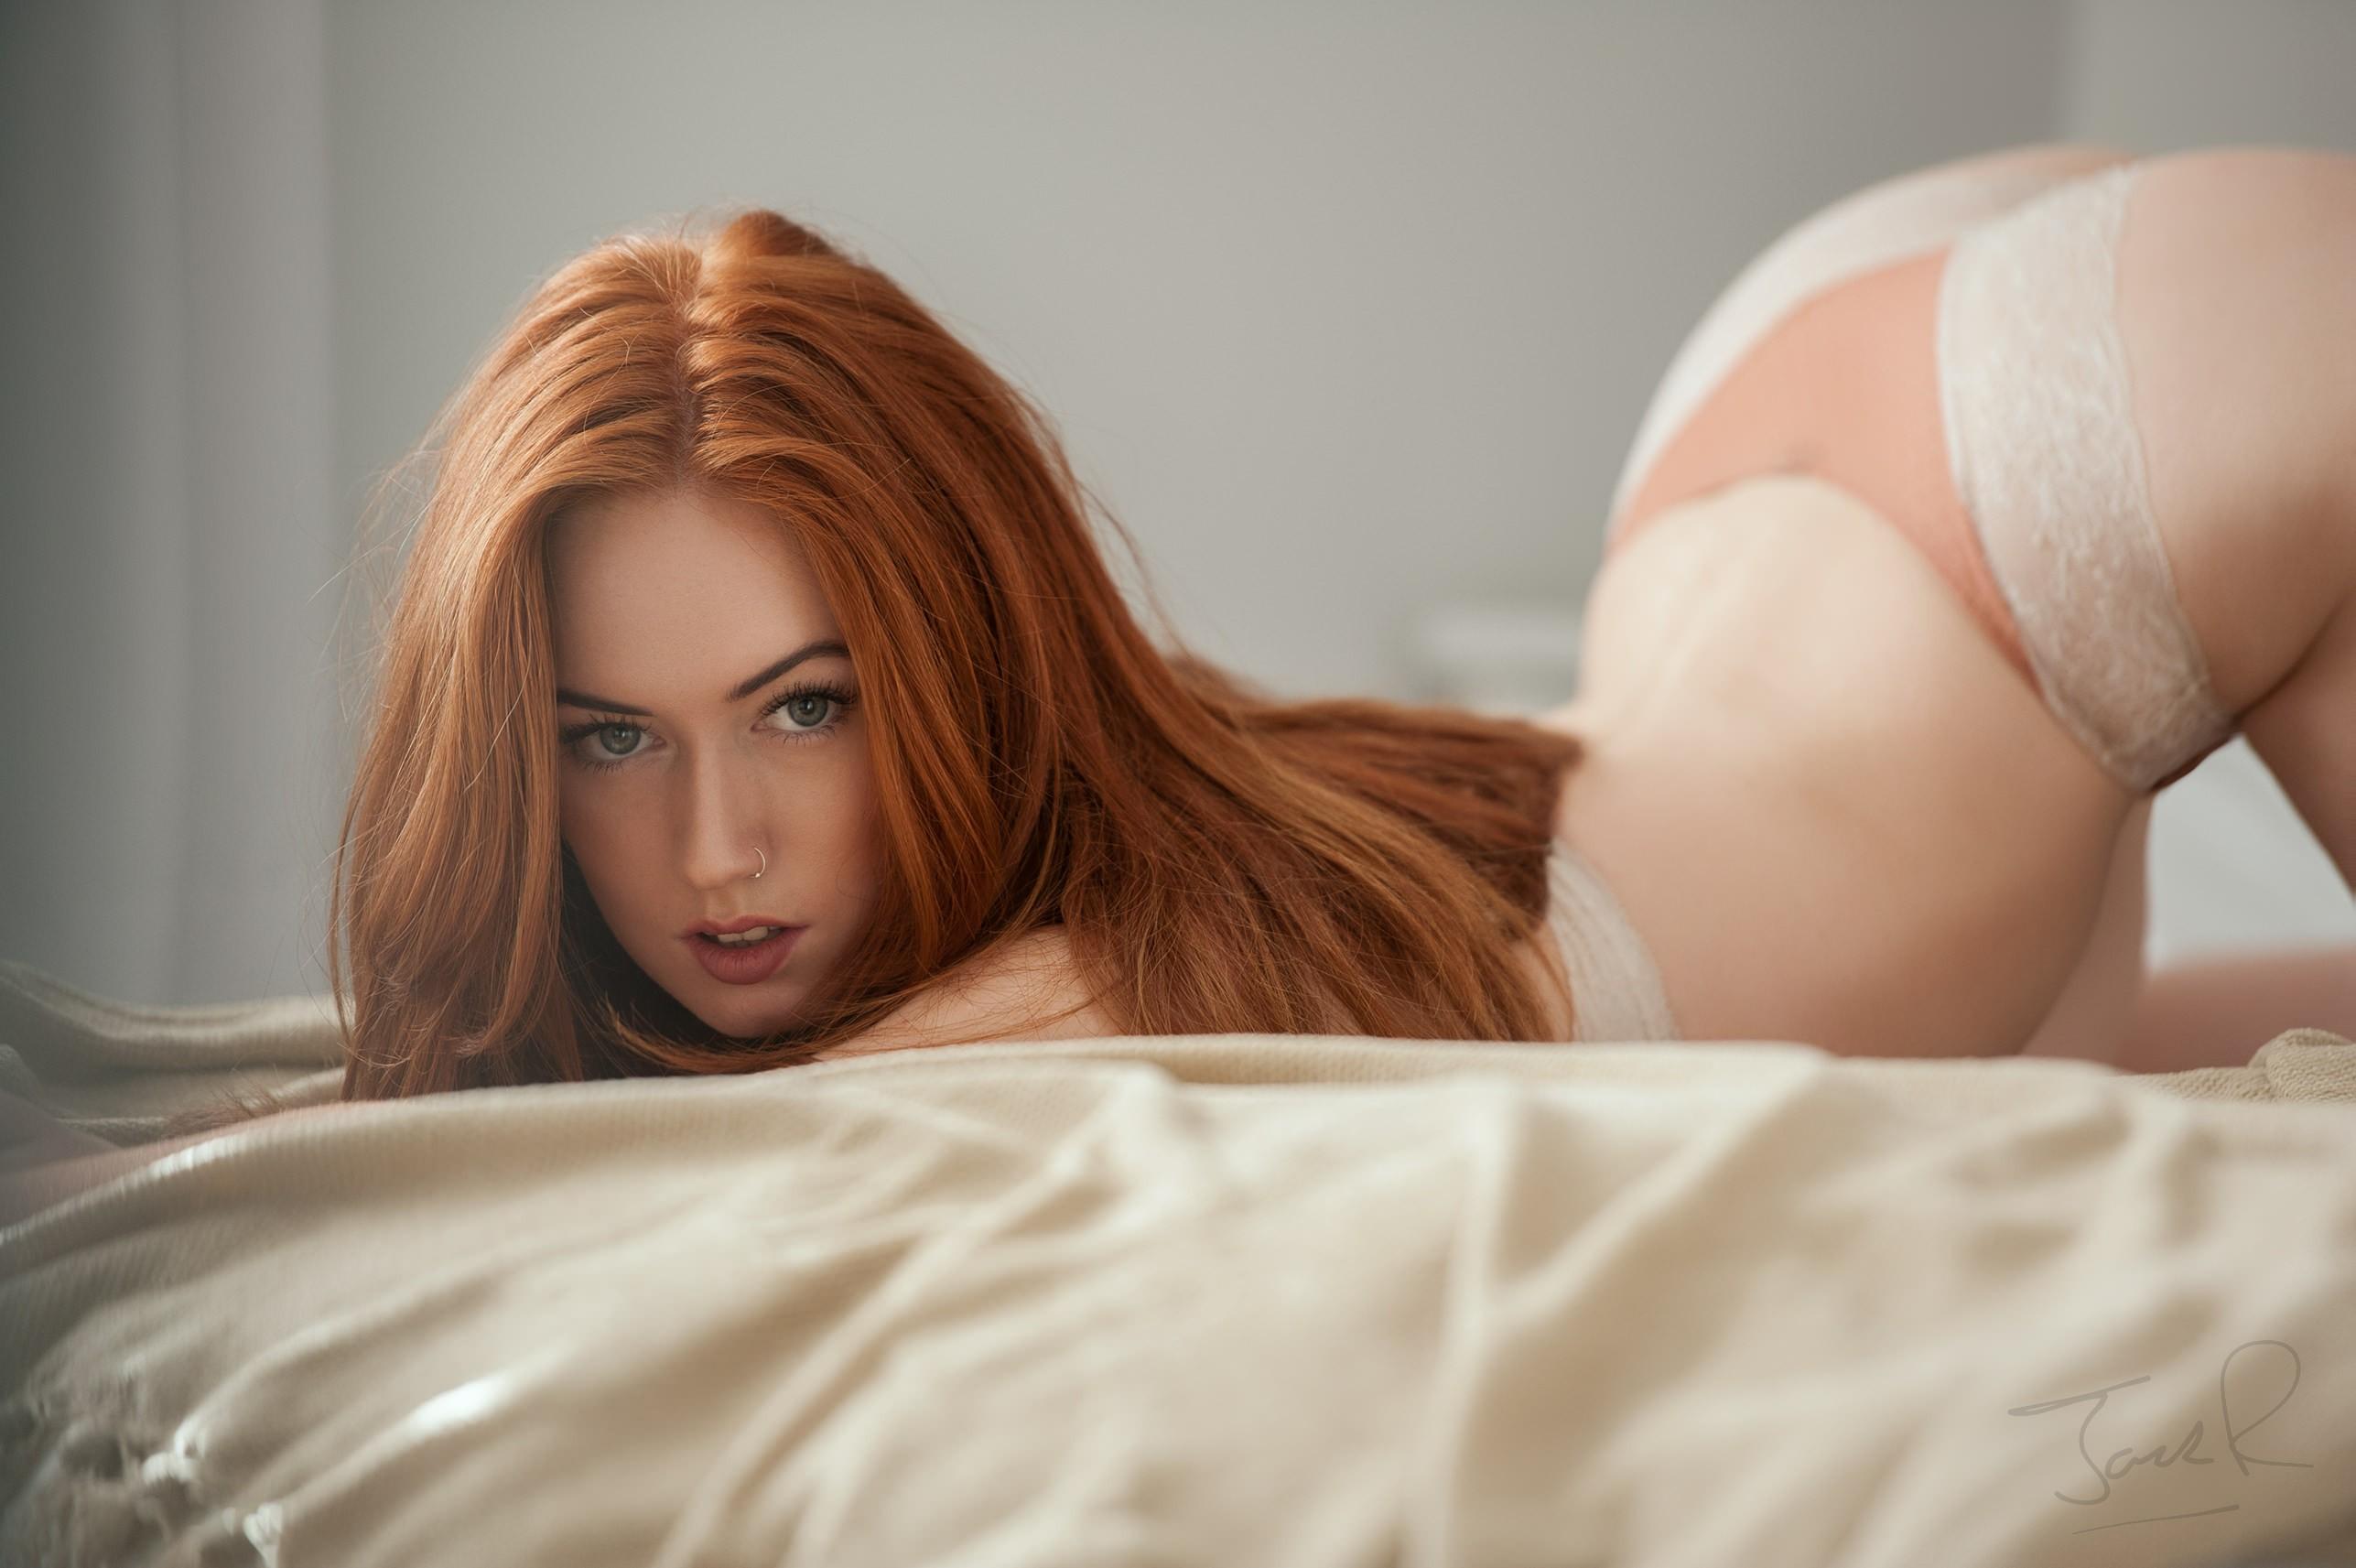 Redhead polecat Terry Sullivan shows what hides inside her pussy № 14637  скачать